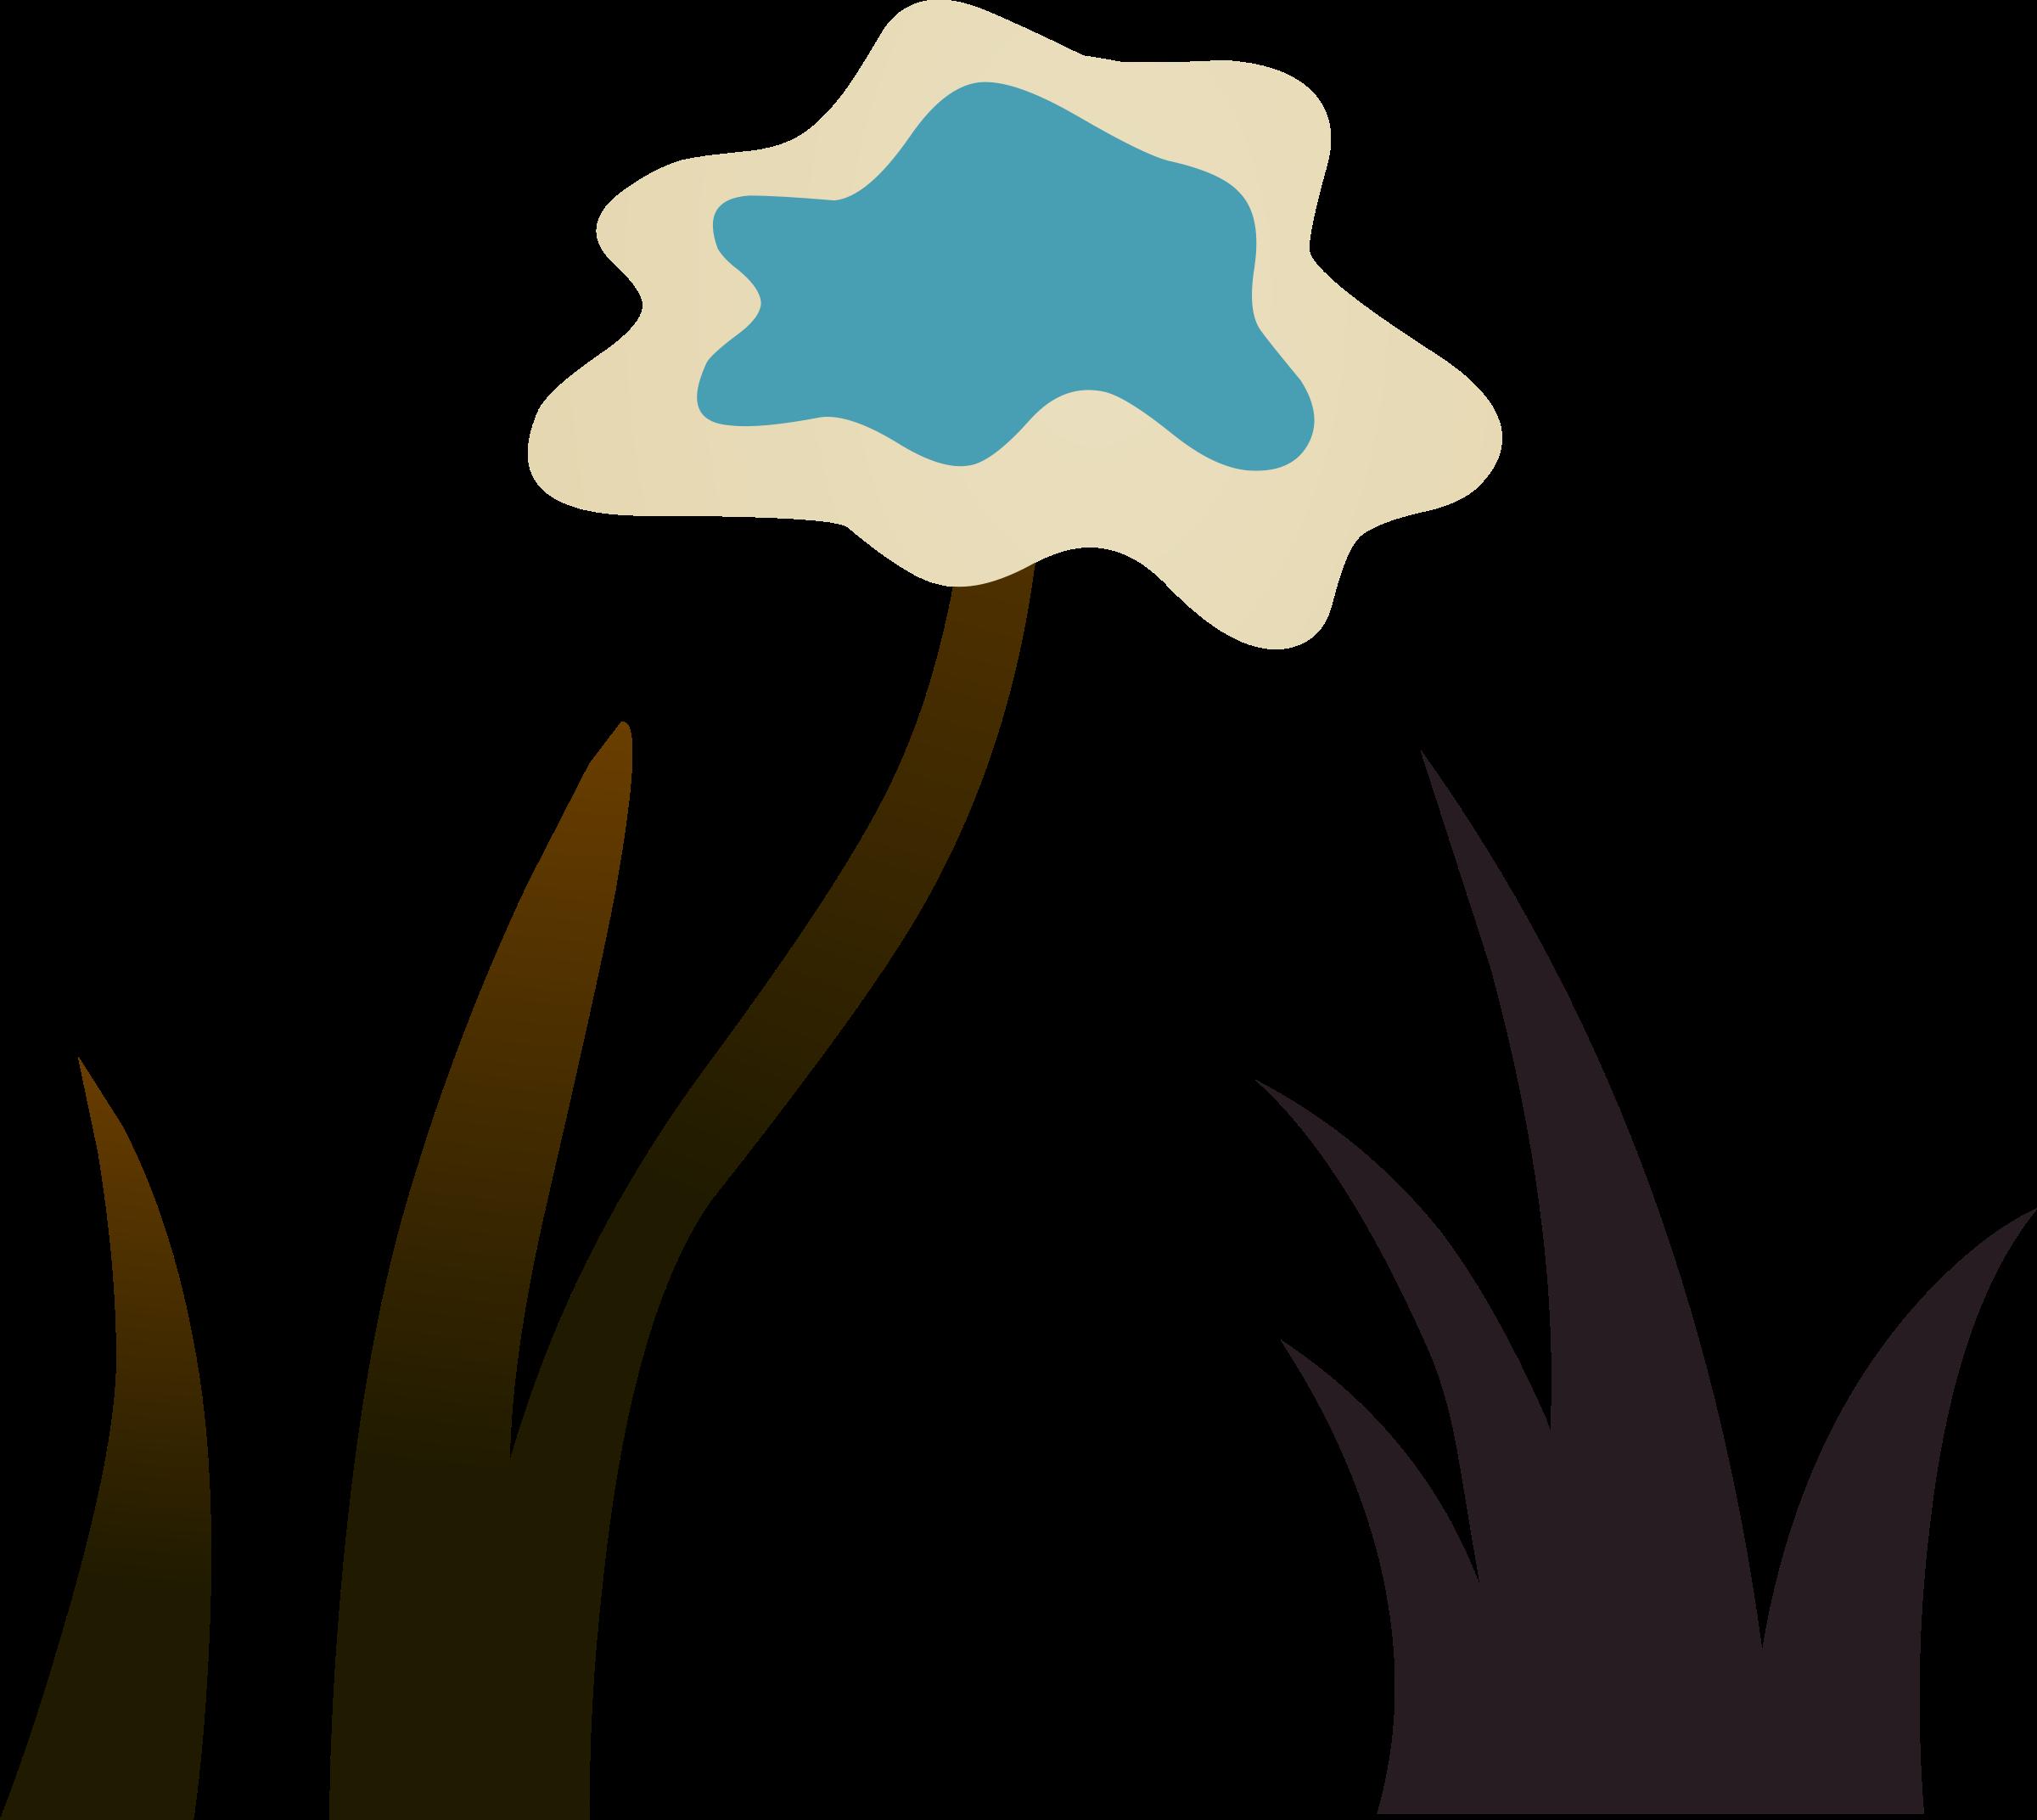 Glitch clipart flowery #8